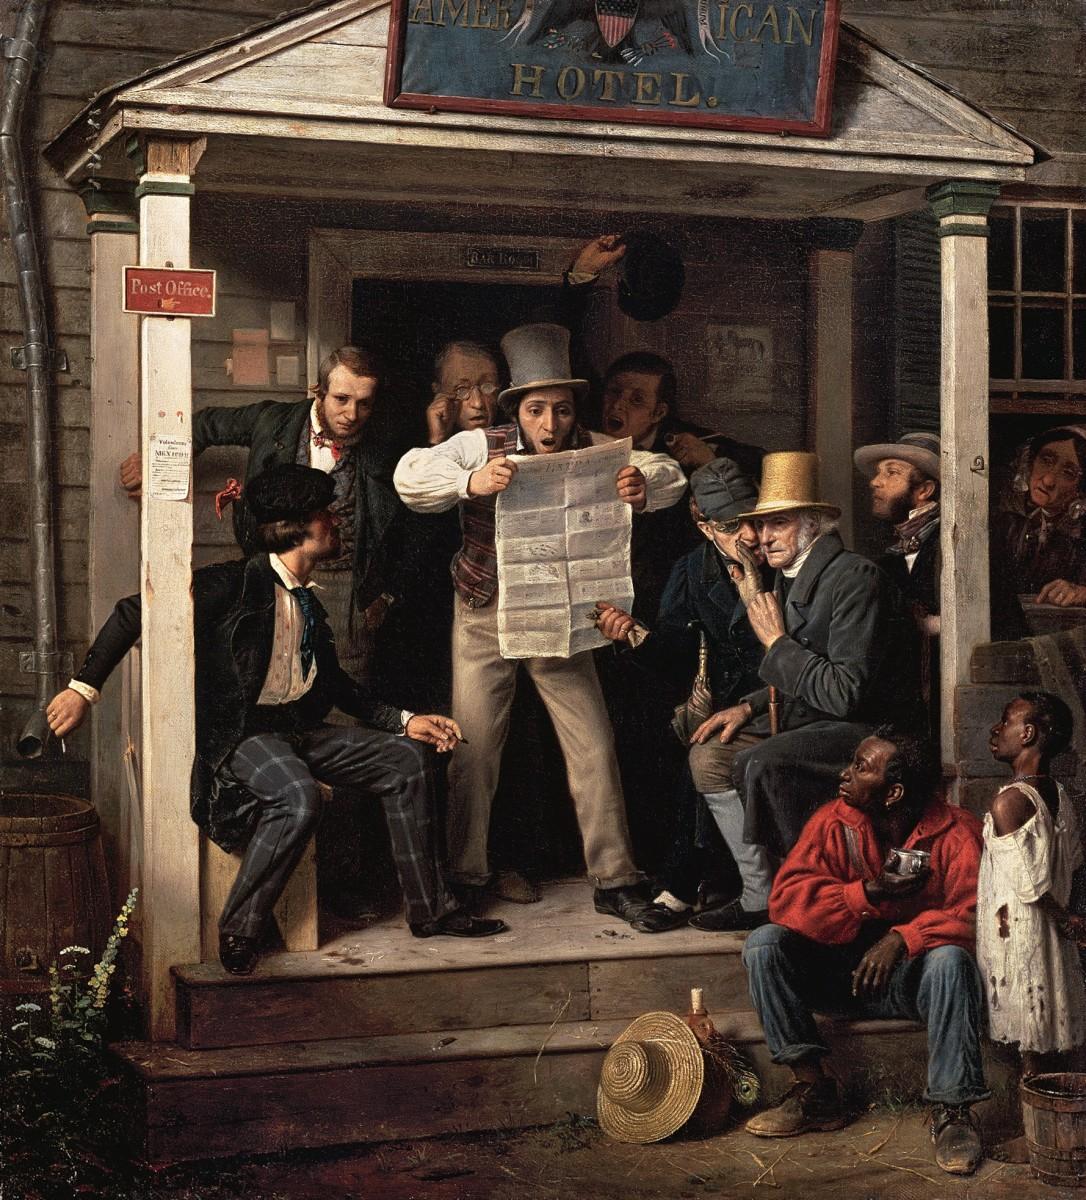 Siege of Vicksburg: The Newspaper Printed on Wallpaper